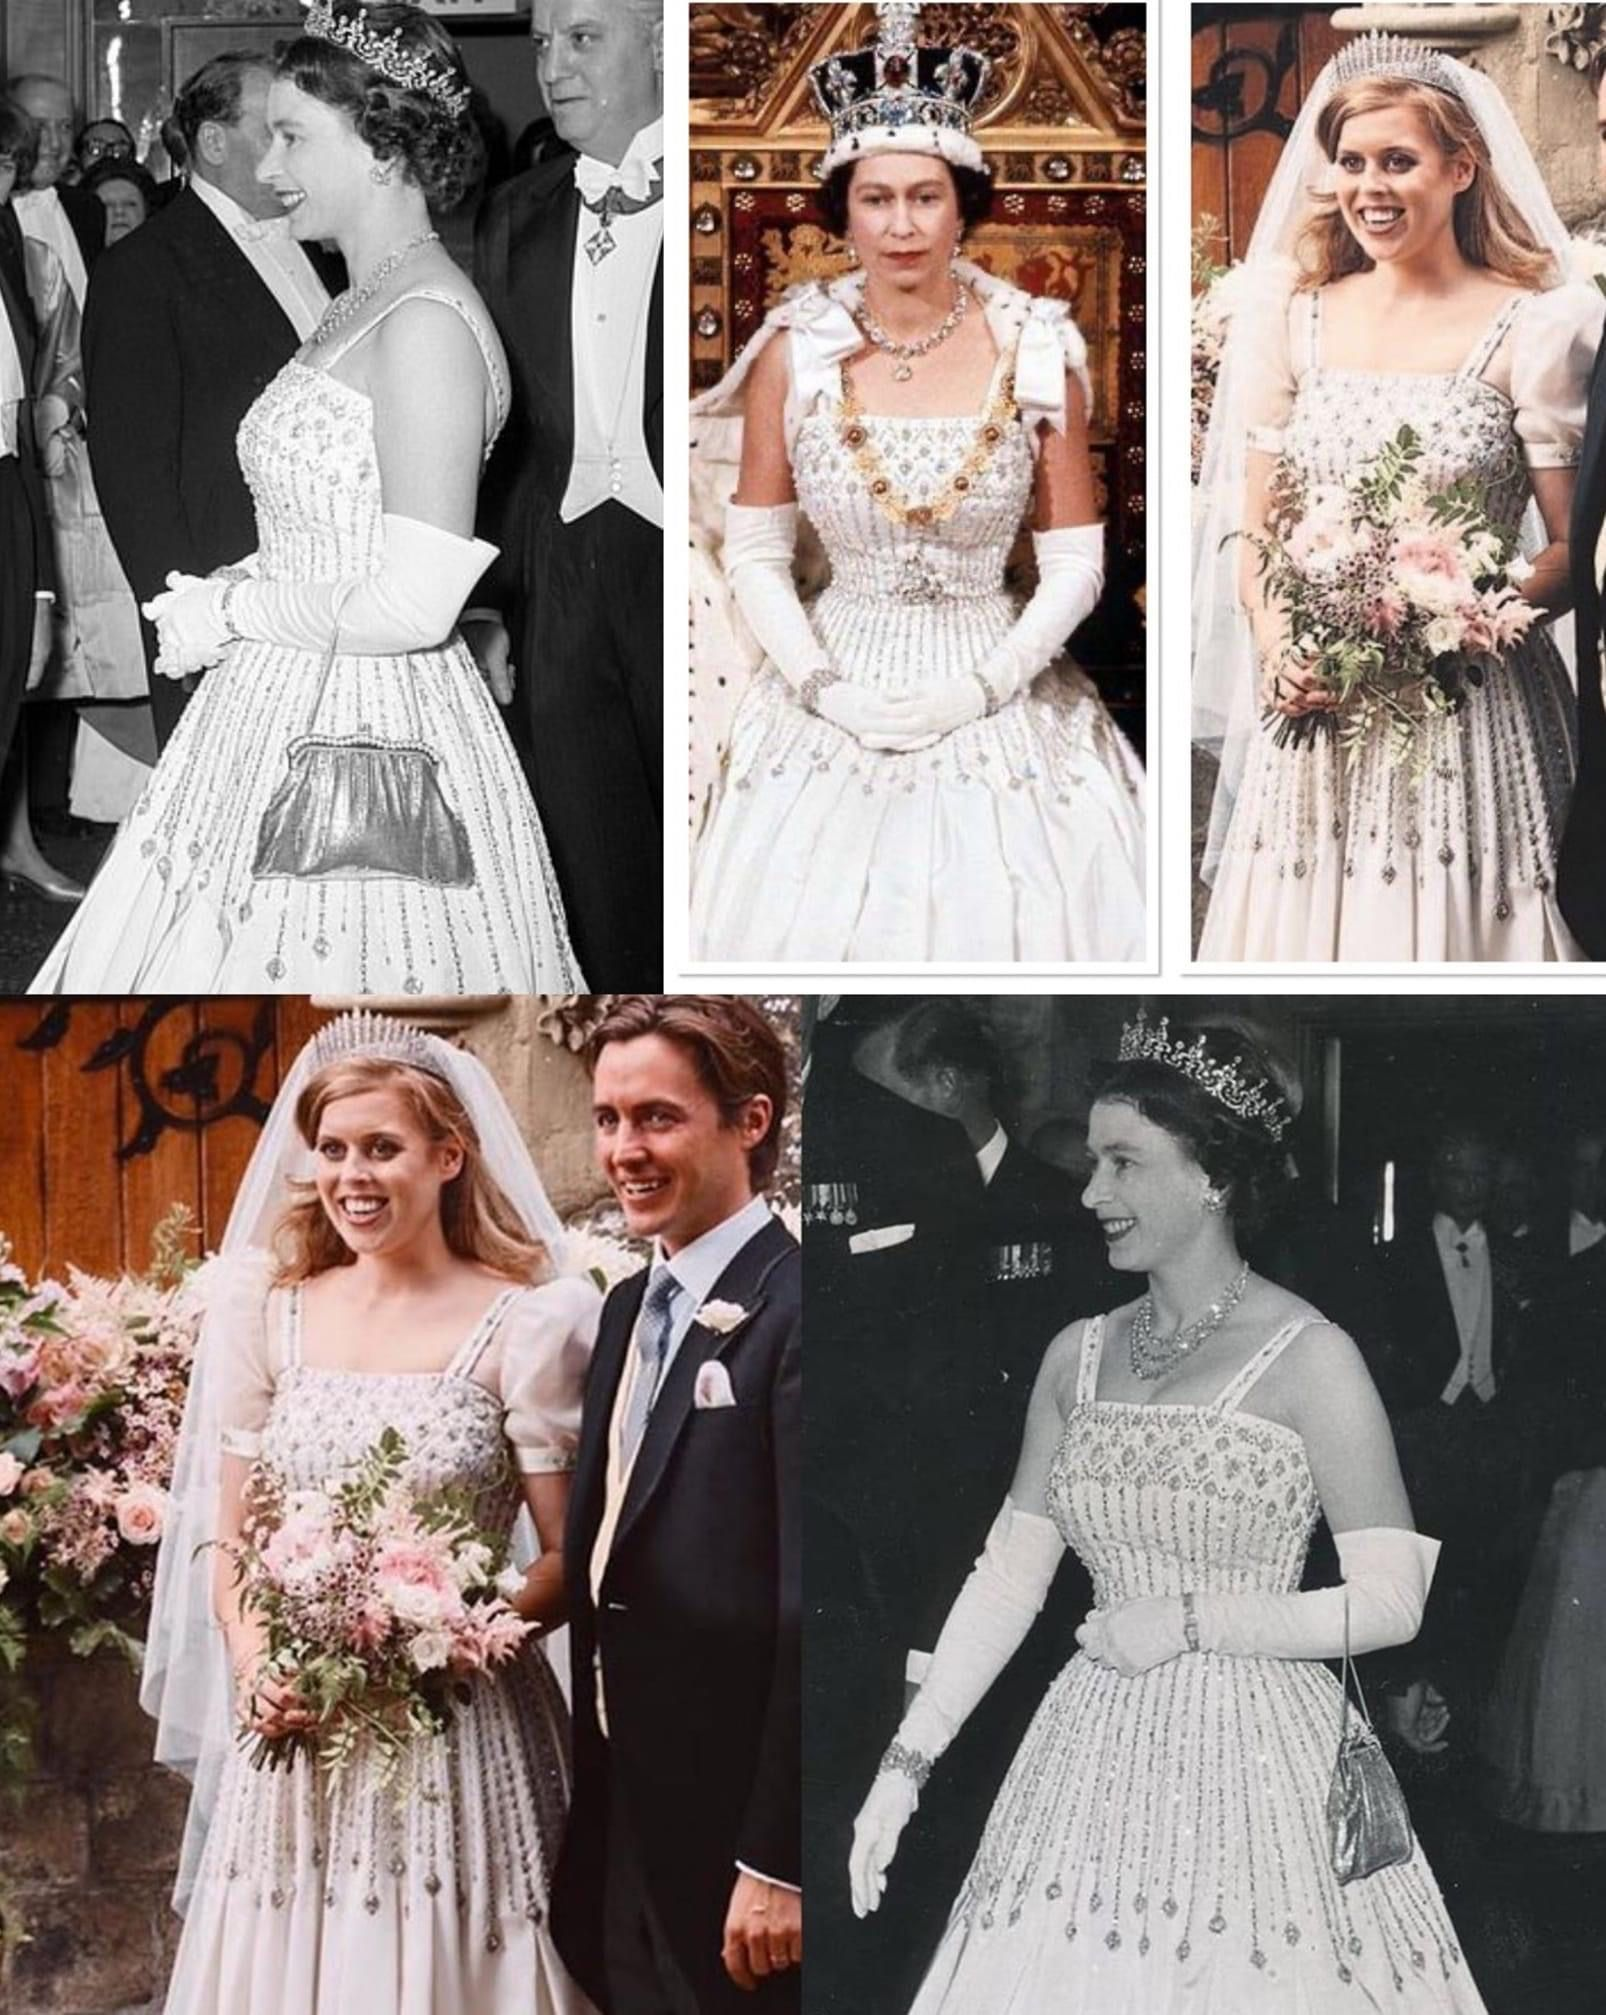 Pin By Jackie Bamford Martin On The Royal Family Princess Beatrice Wedding Wedding Dresses Lace Royal Weddings [ 2015 x 1606 Pixel ]